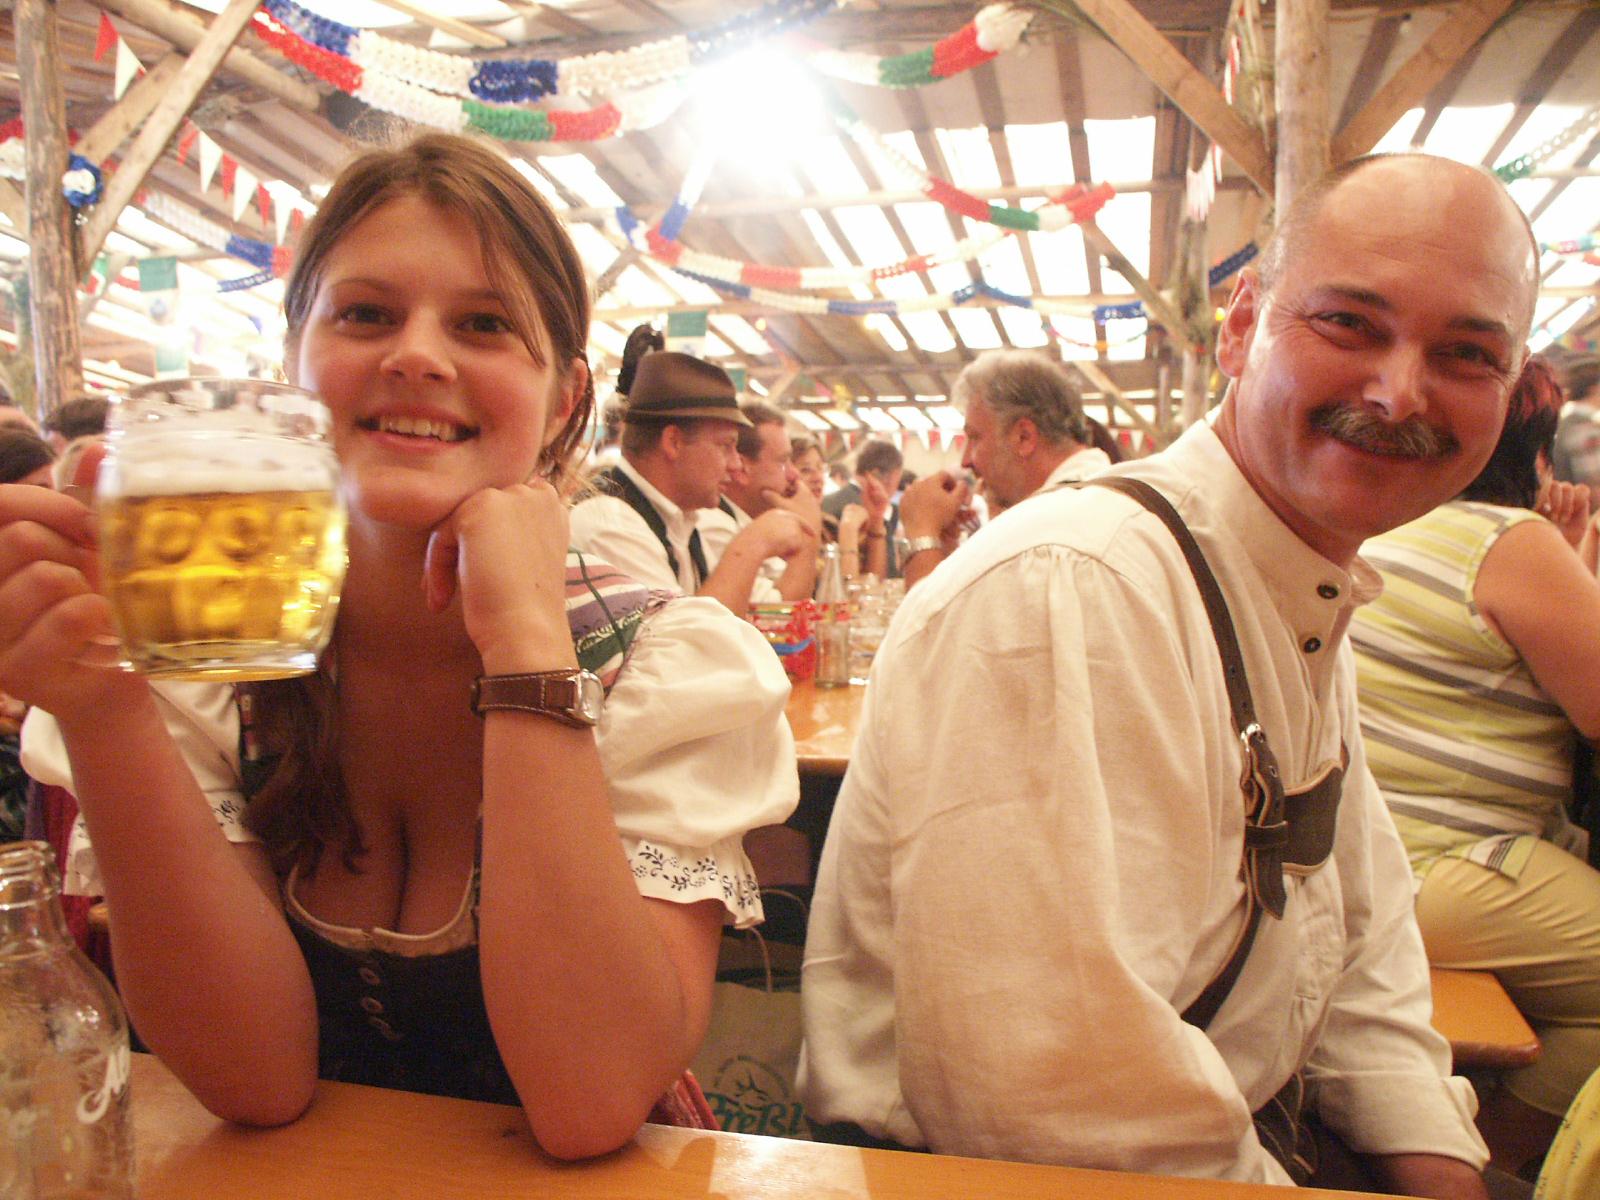 Bierzeltgaudi - Bierzelt-Gaudi_© TVB Ausseerland - Salzkammergut-Griese- Zeltfest - Feuerwehrfest - Feierlaune - Stimmung